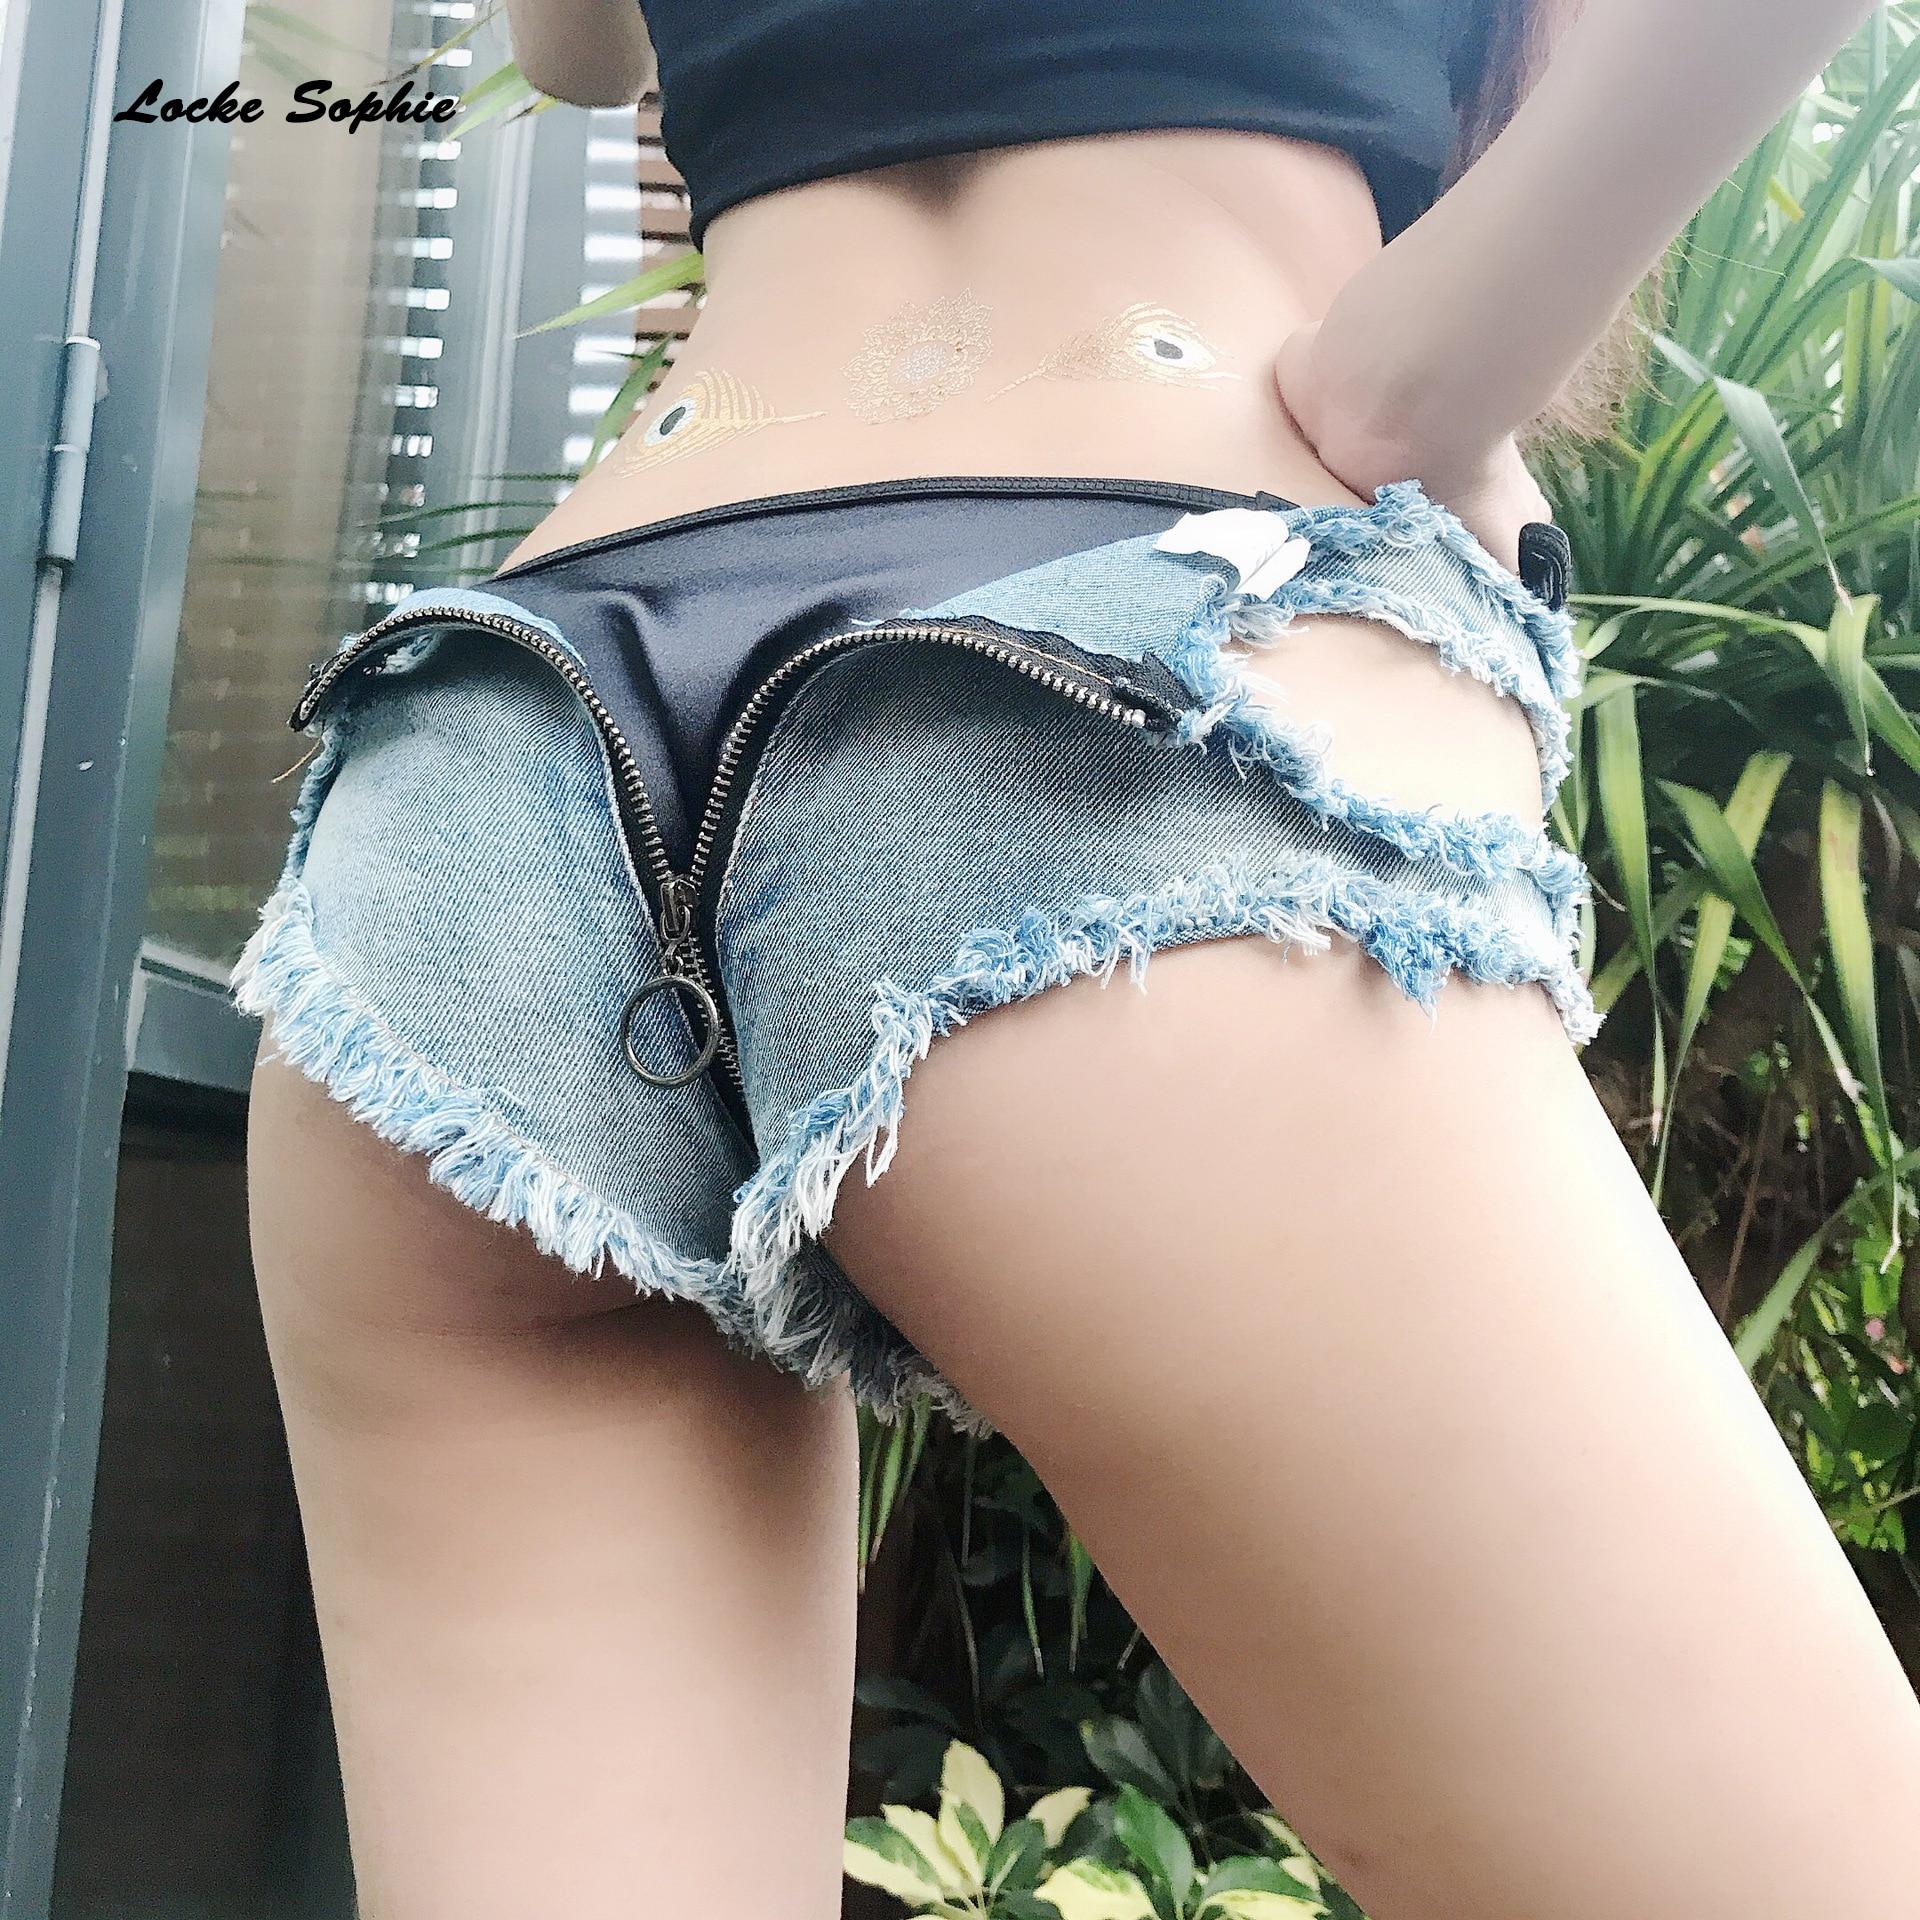 Low Waist Women's Jeans Denim Shorts  Summer Denim Cotton Bandage Zipper Splicing Hole Ladies Skinny Sexy Super Short Jeans